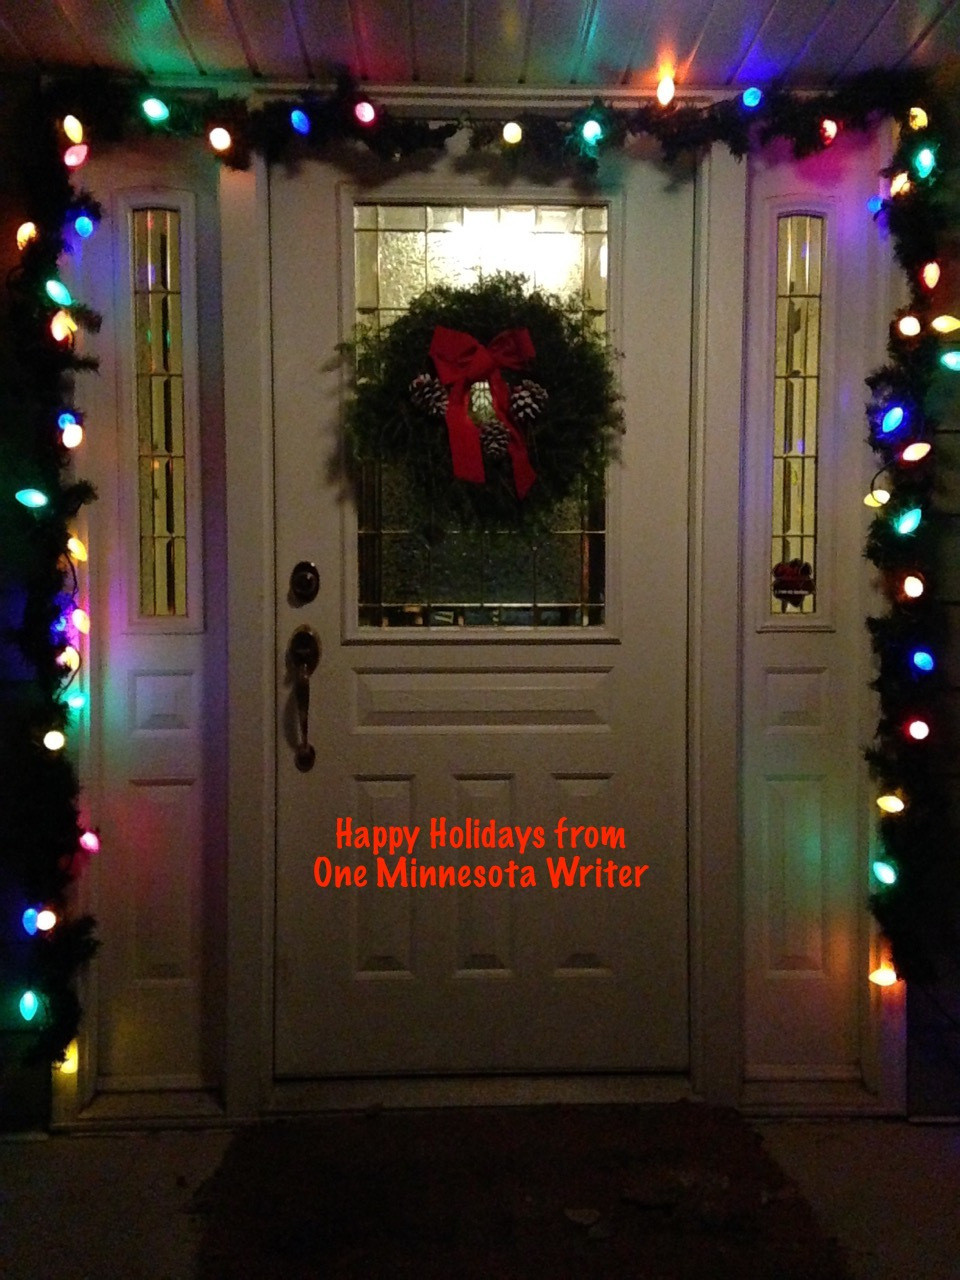 happy holidays from one minnesota writer